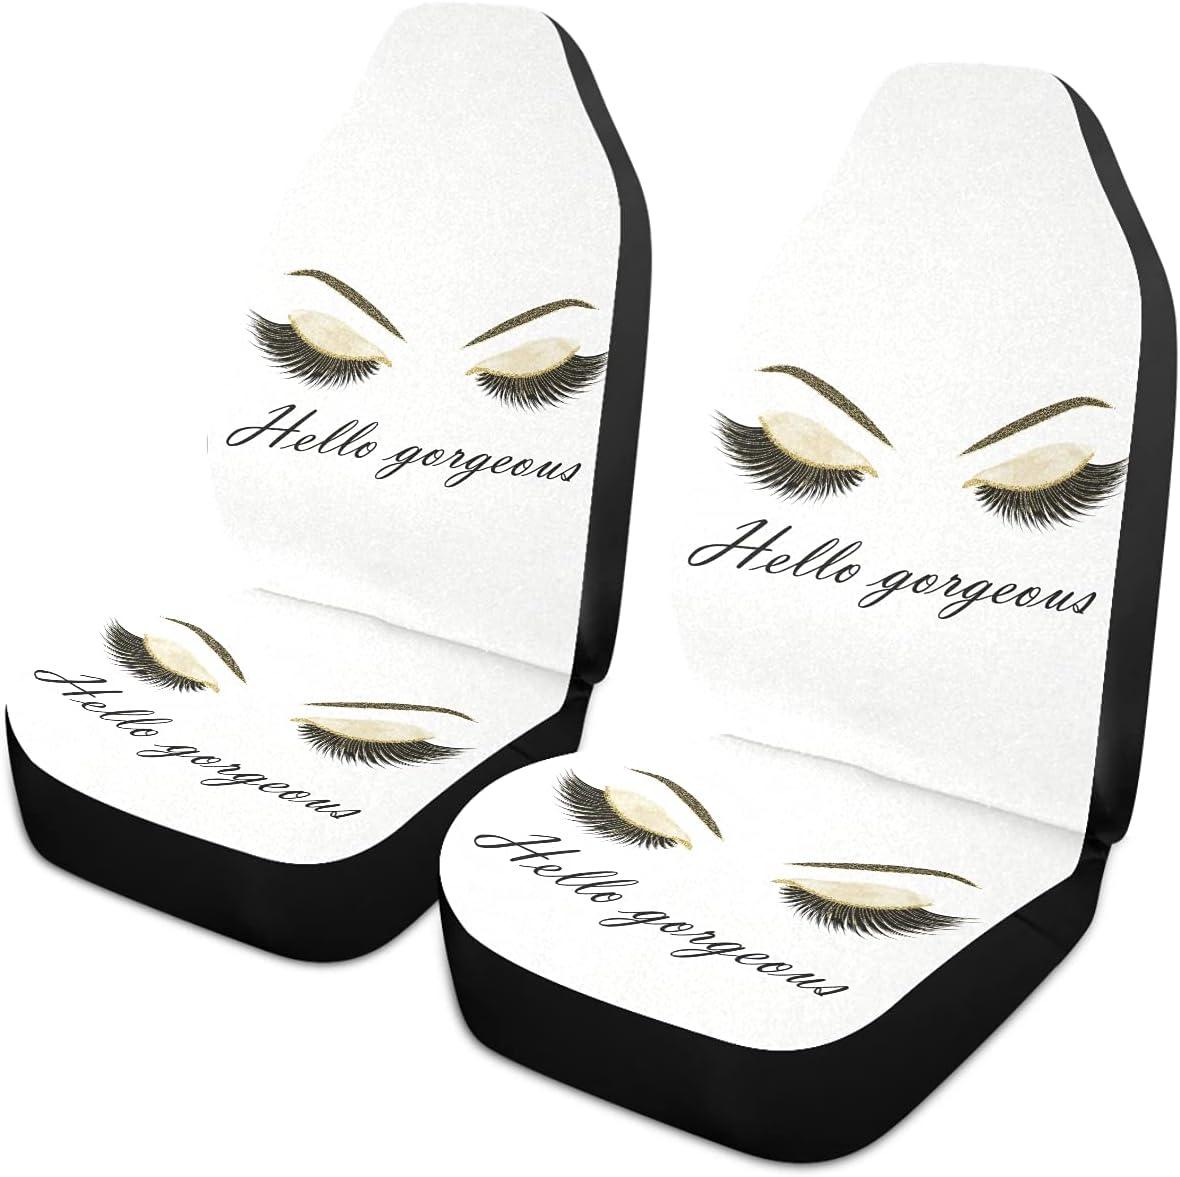 Oarencol Women Eyes Hello Gorgeous Seat Selling rankings Ranking TOP4 Covers Golde Car Eyelash